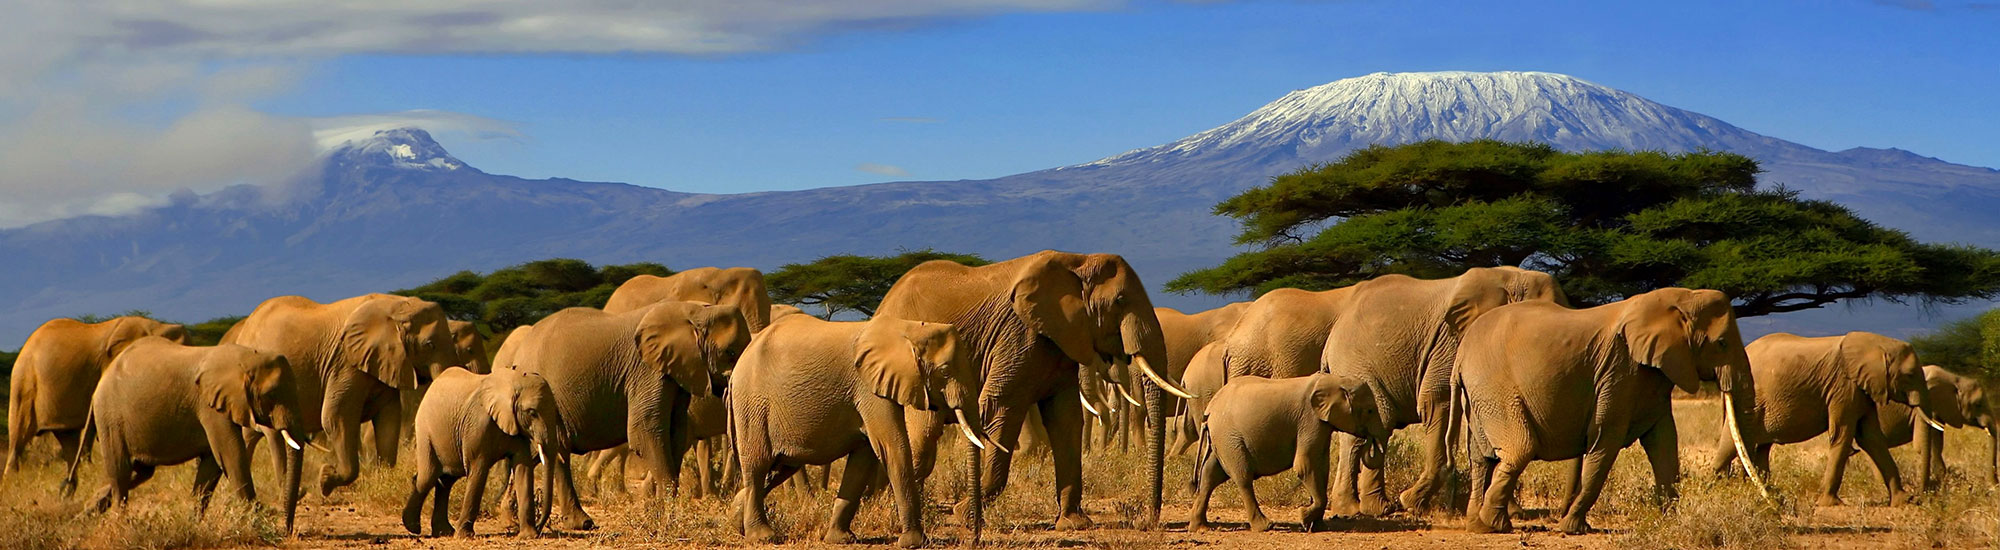 Wildlife Preservation - Elephants